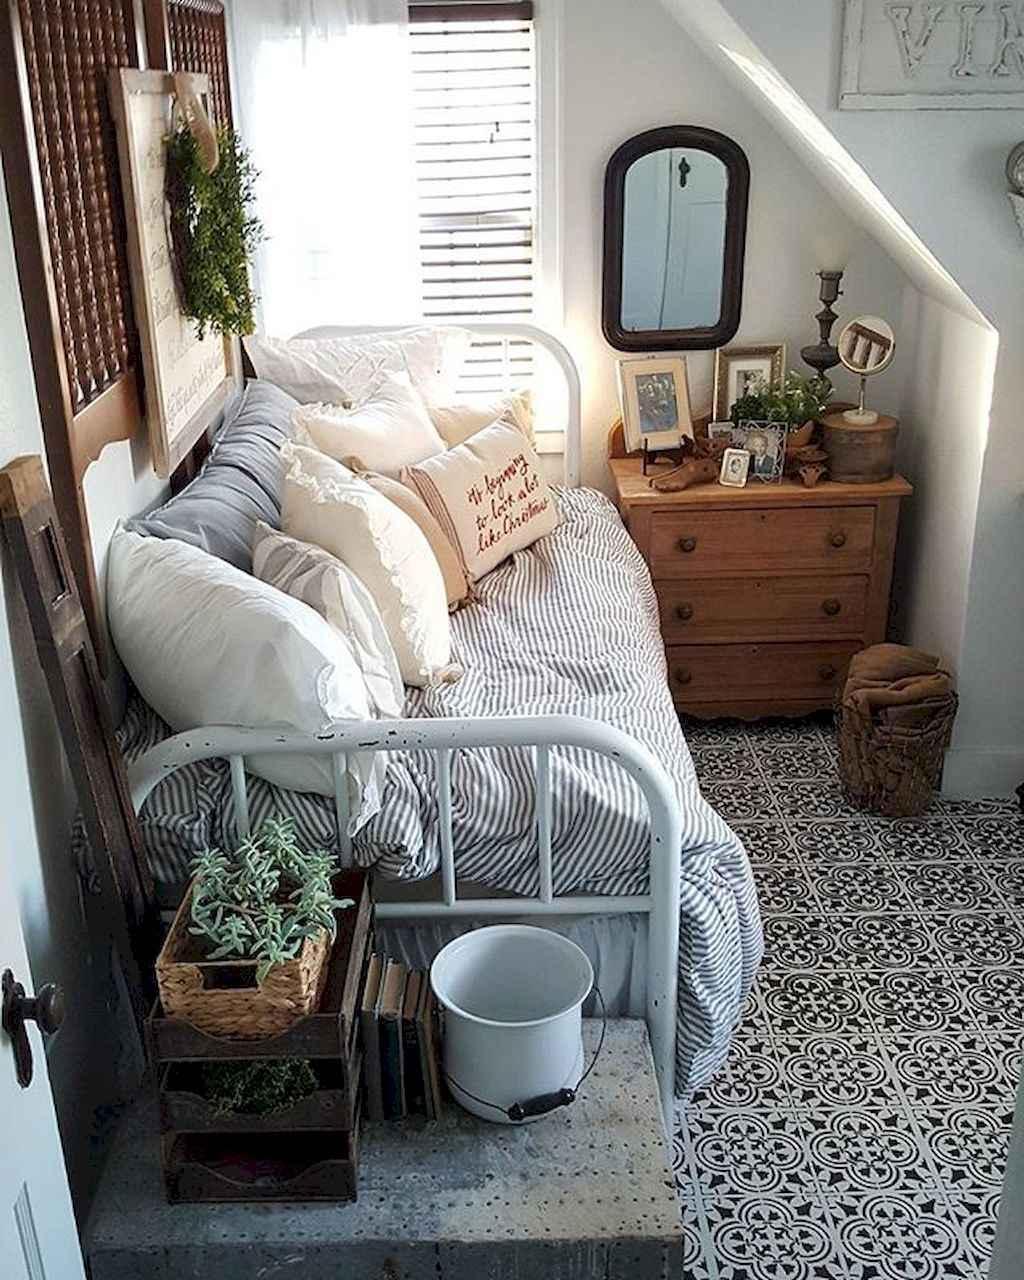 Cute diy dorm room decorating ideas on a budget (32)